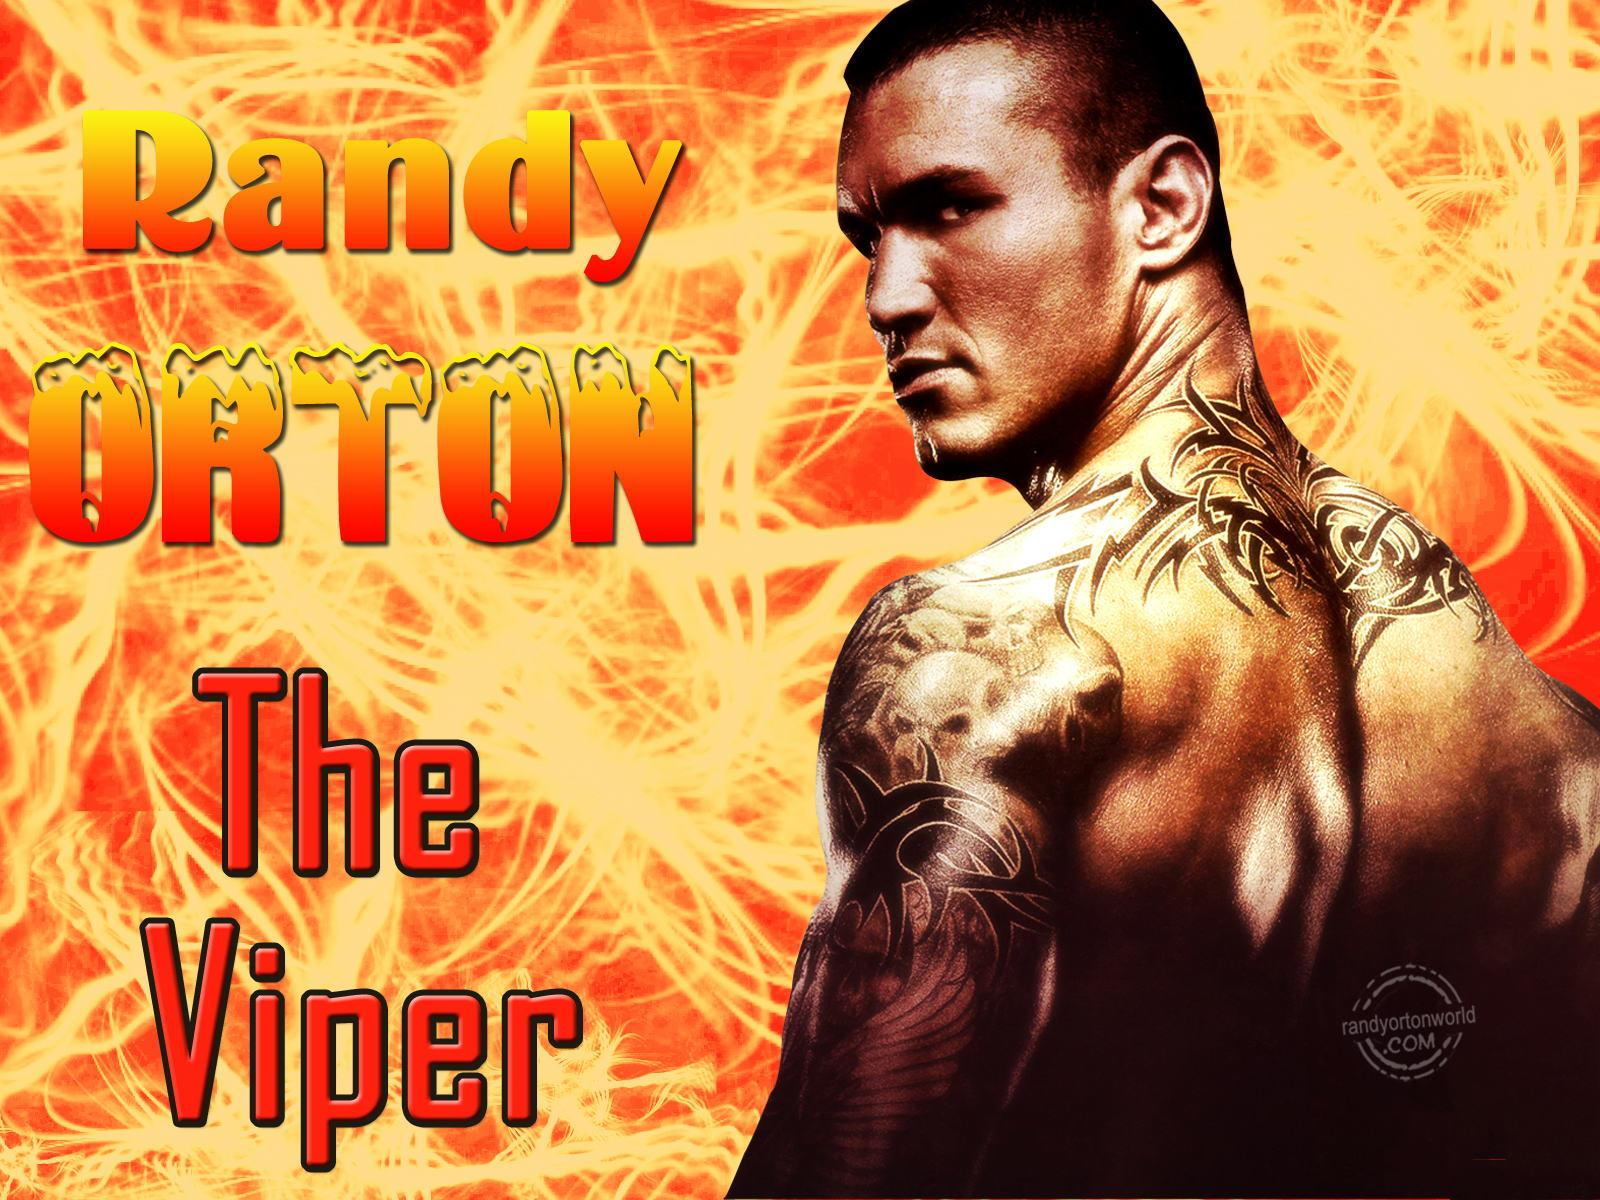 http://2.bp.blogspot.com/-592BN3iFDT0/T9CjElZVMII/AAAAAAAACQI/acxrAX_HsoU/s1600/WWE+Randy+Orton+hd+Wallpapers+2012_3.jpg